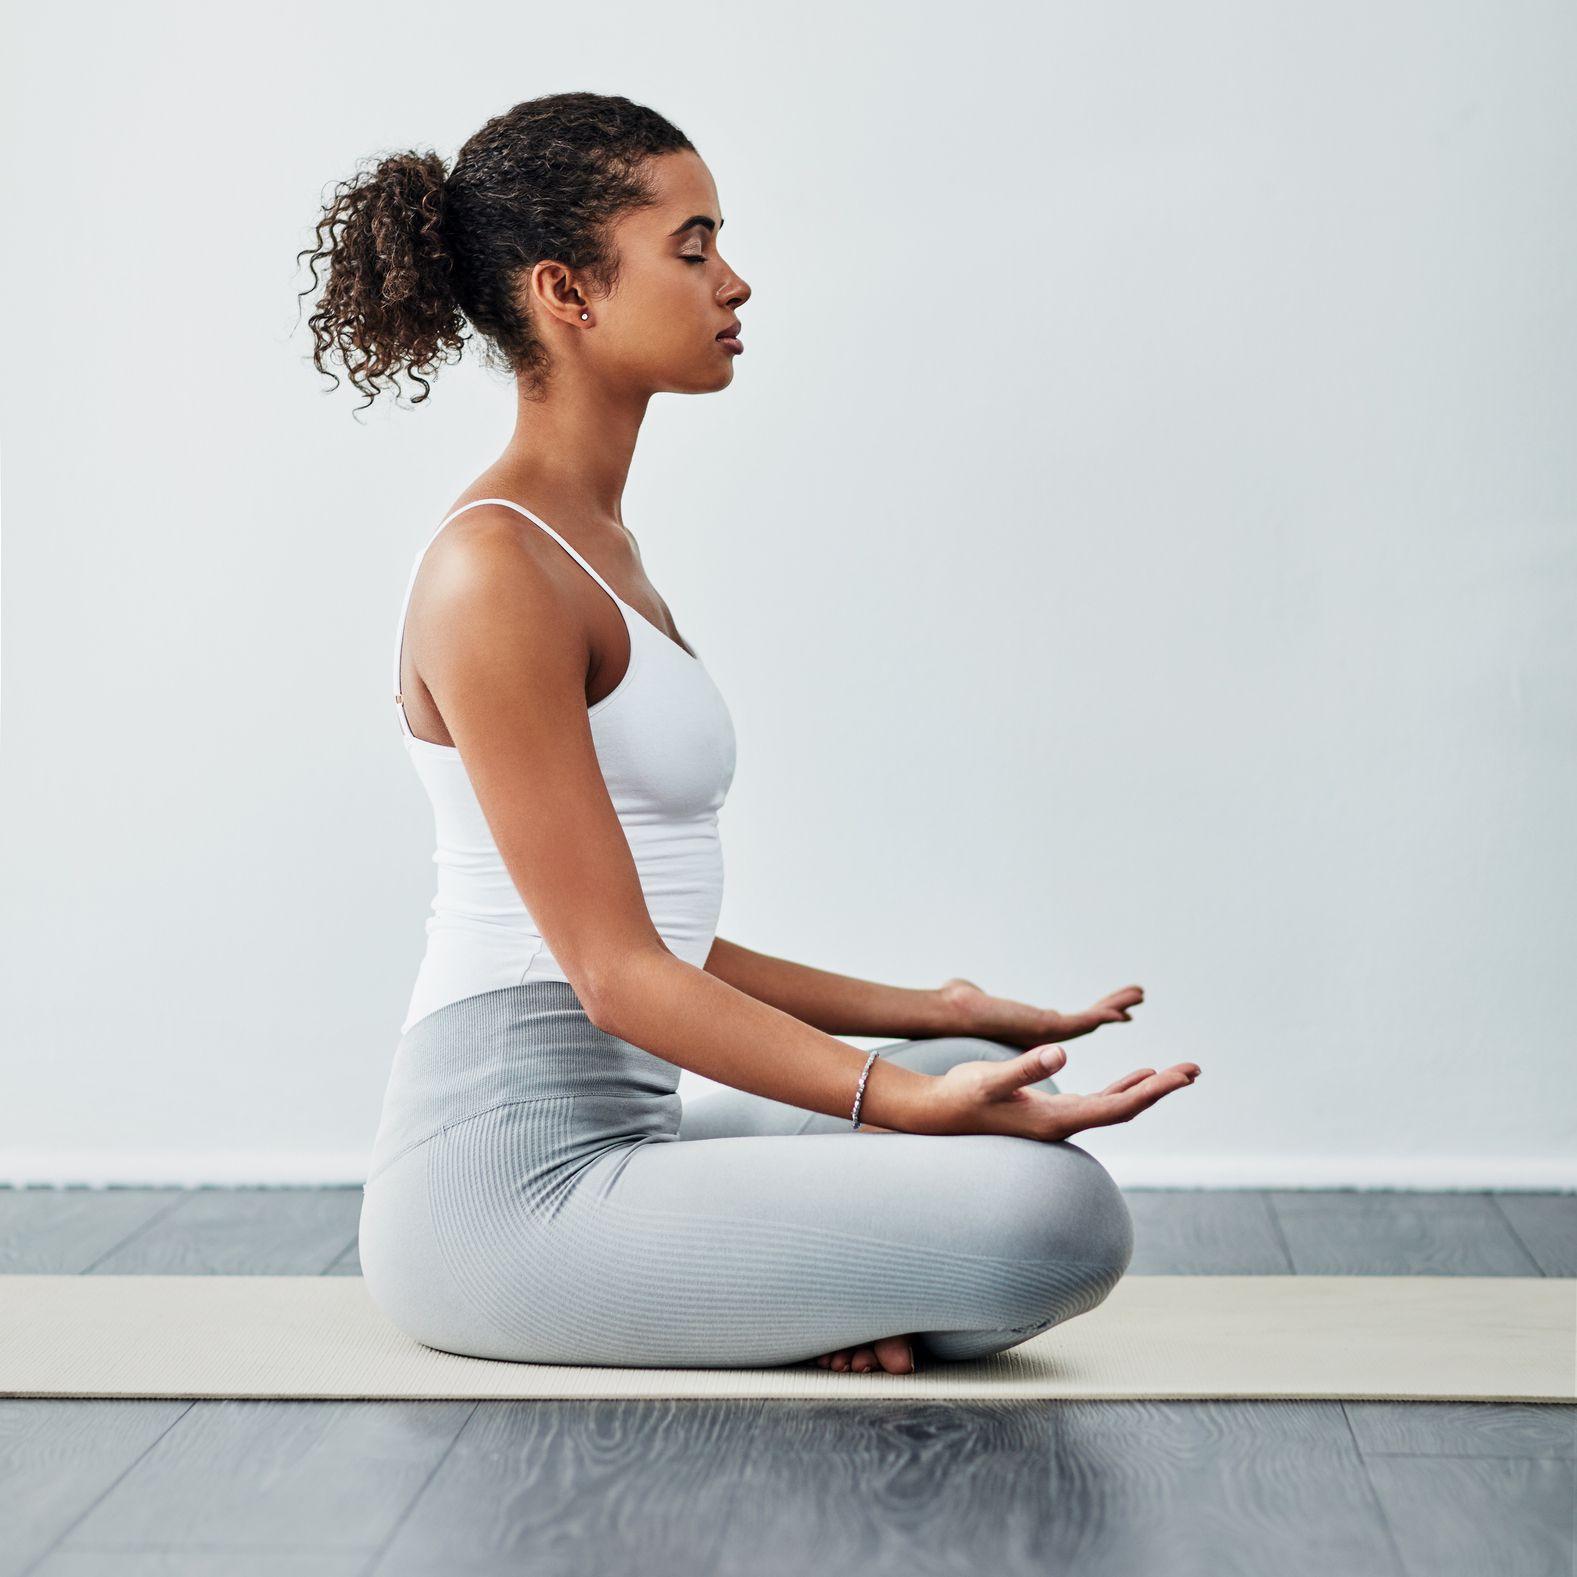 woman meditating side view